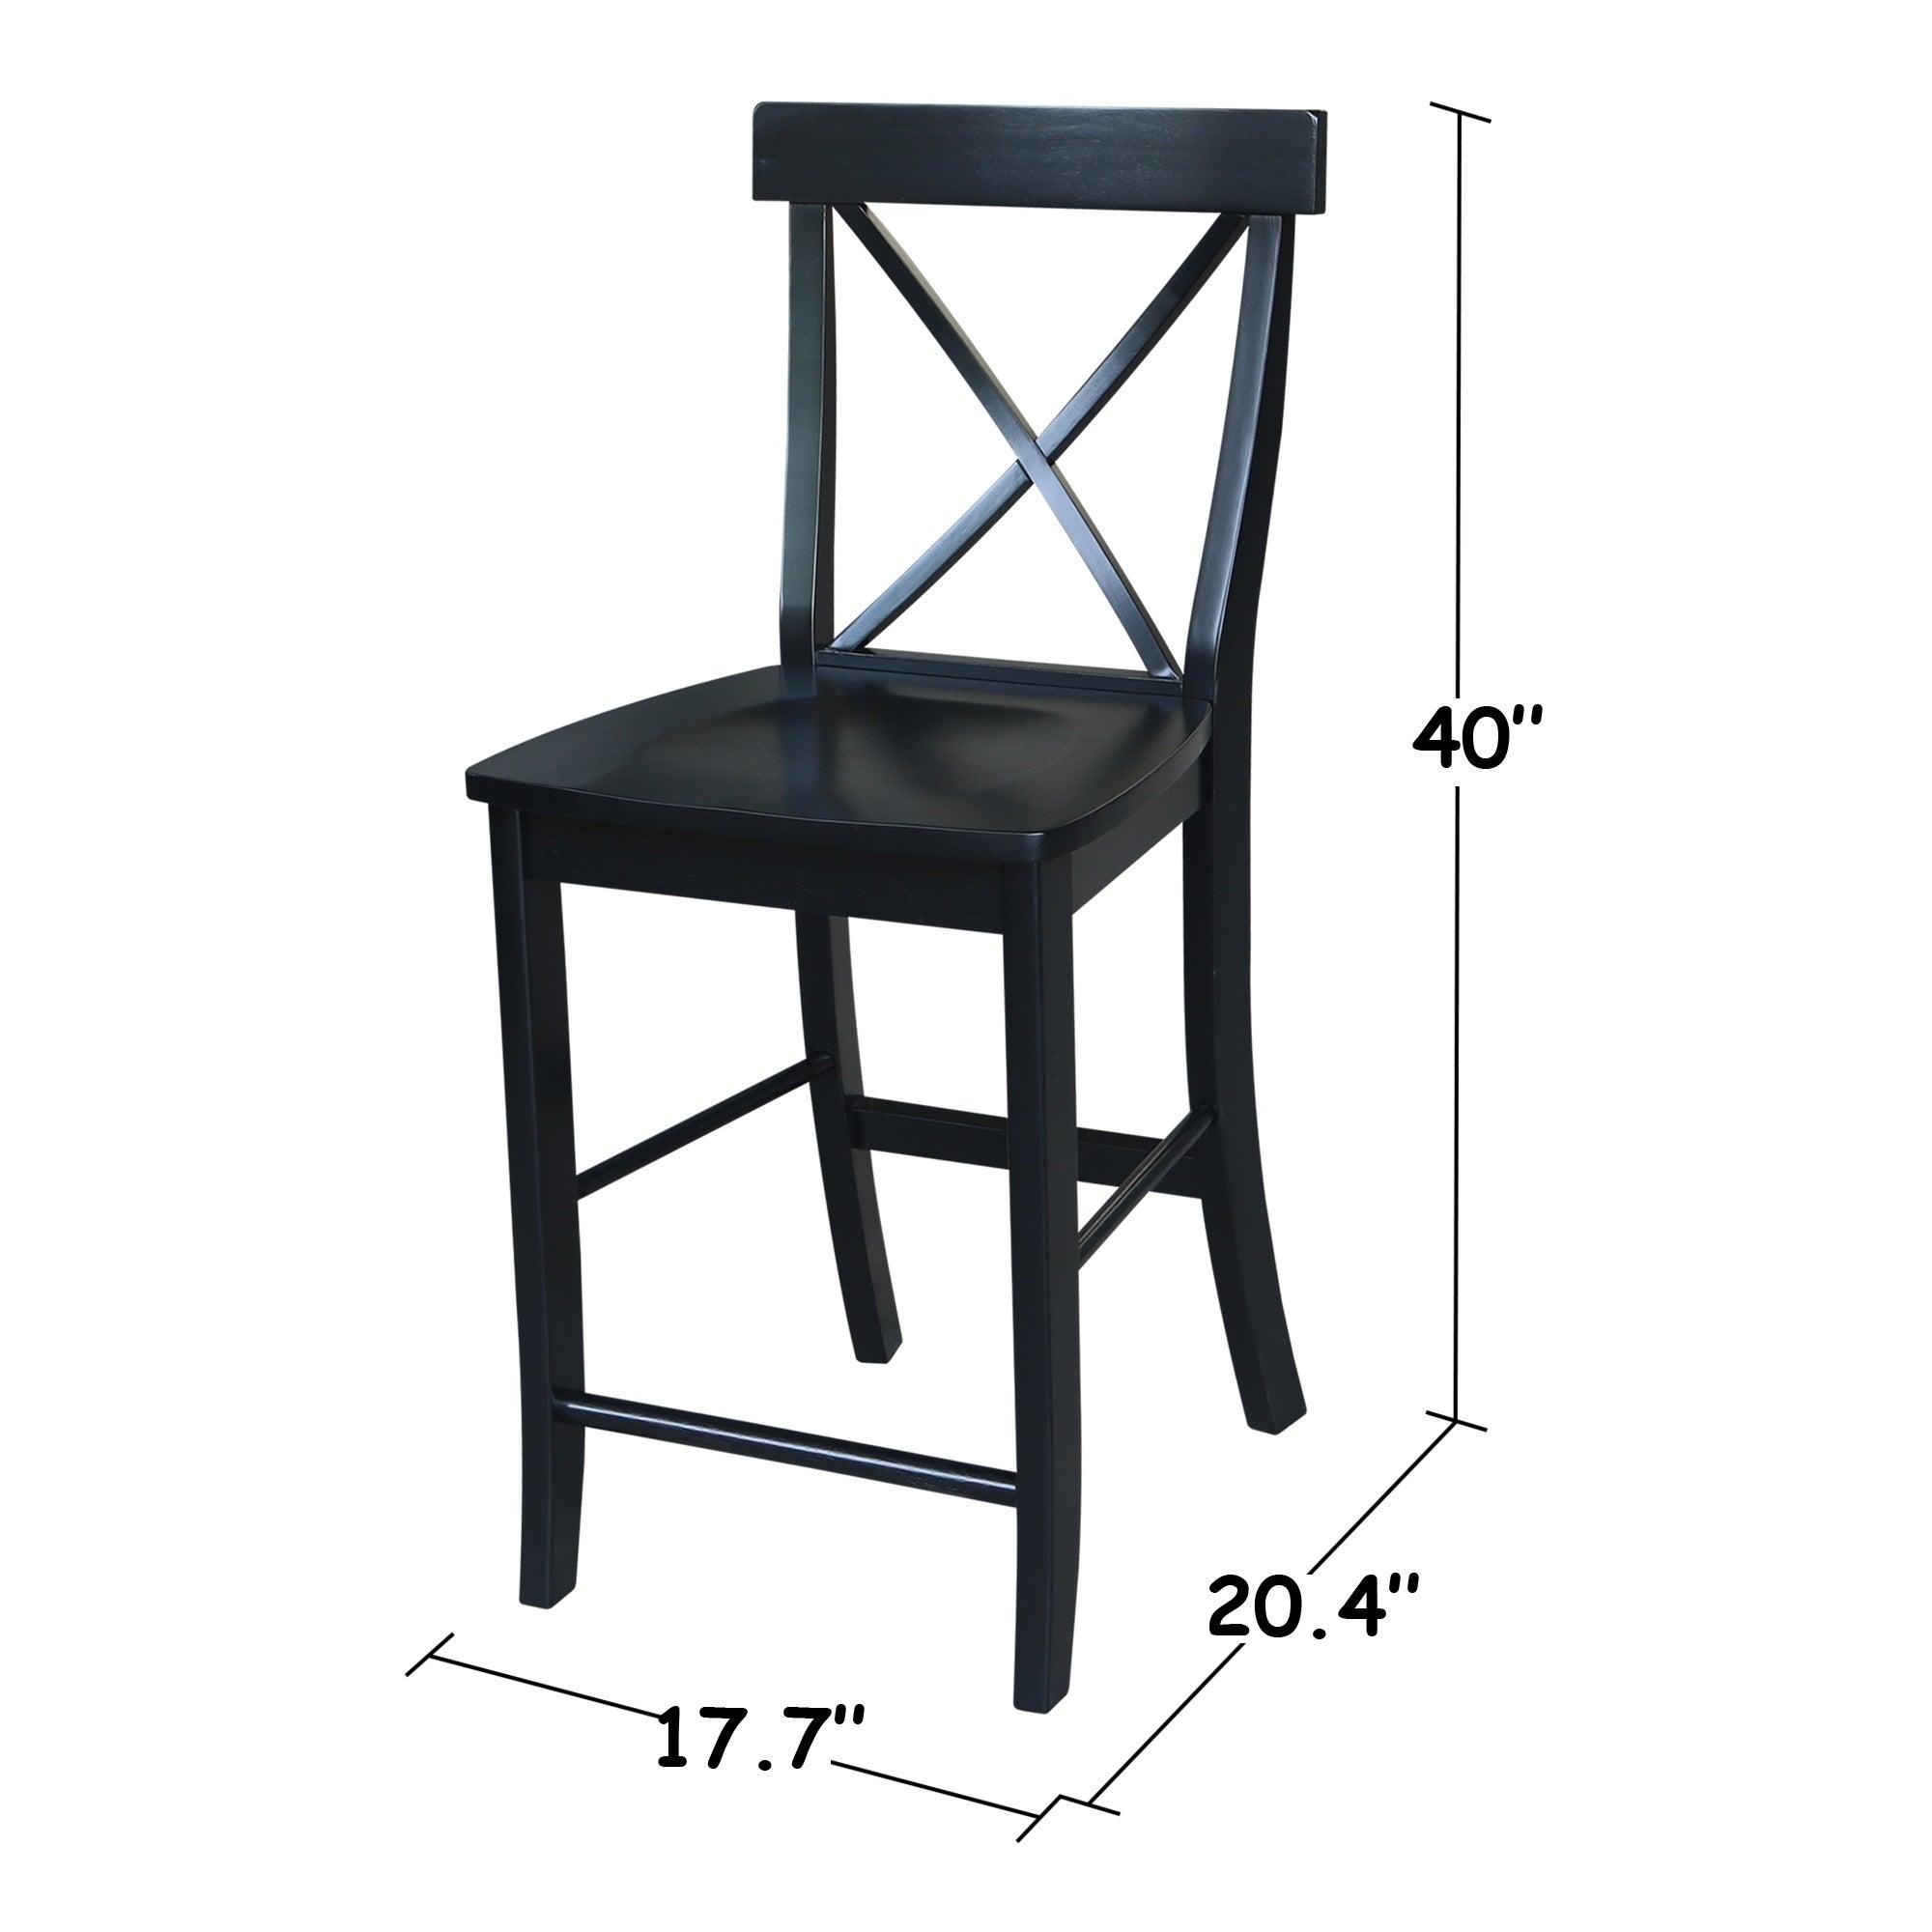 Fantastic X Back Counter Stool In Black N A Creativecarmelina Interior Chair Design Creativecarmelinacom